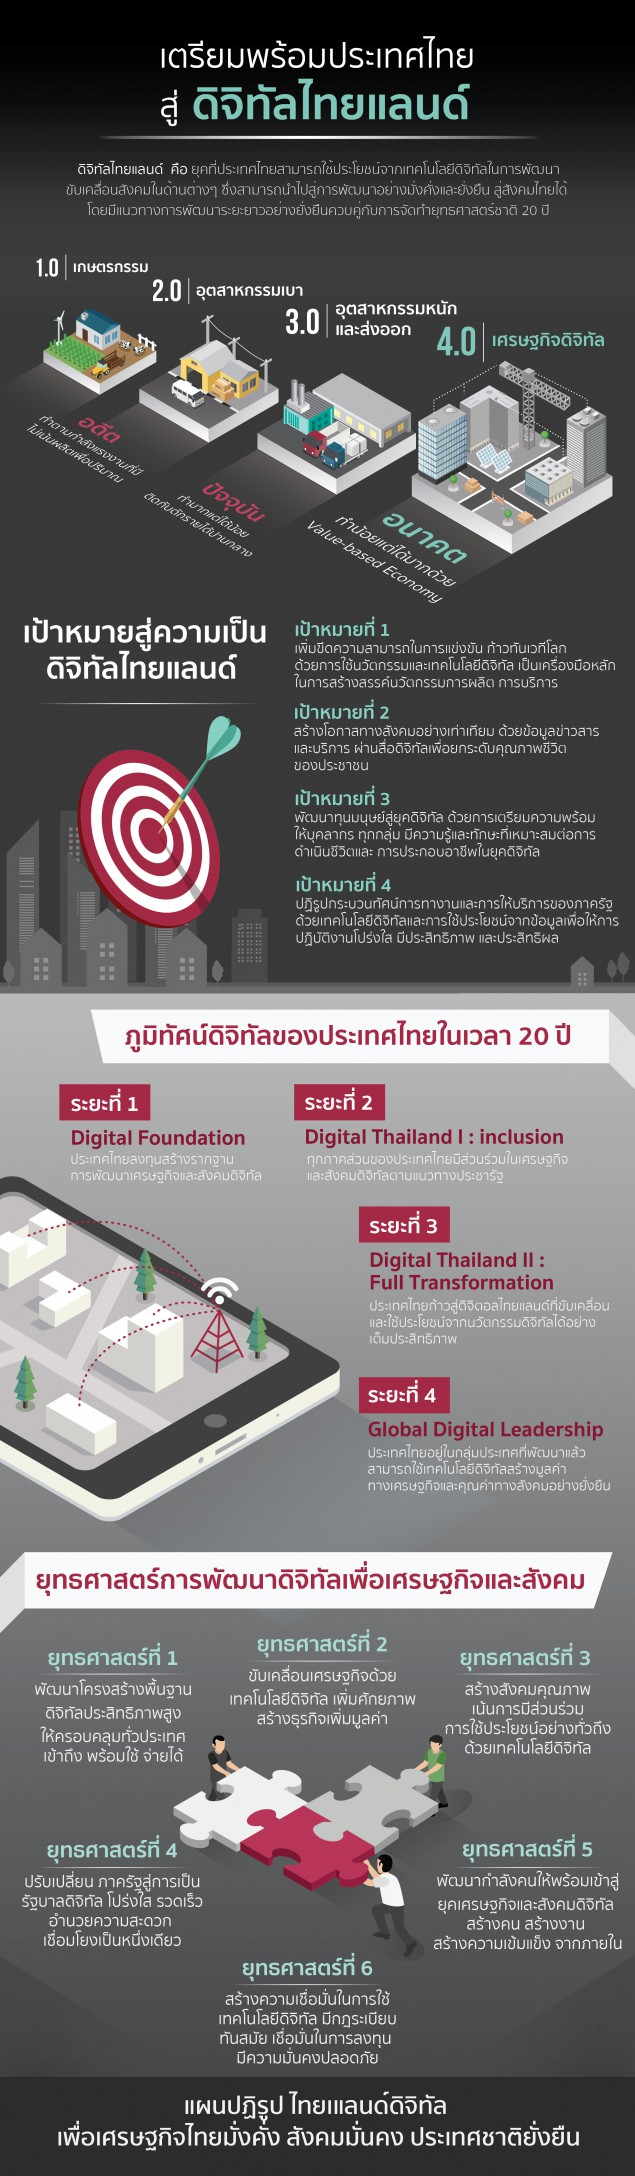 Digital Thailand 4.0-01 (1)